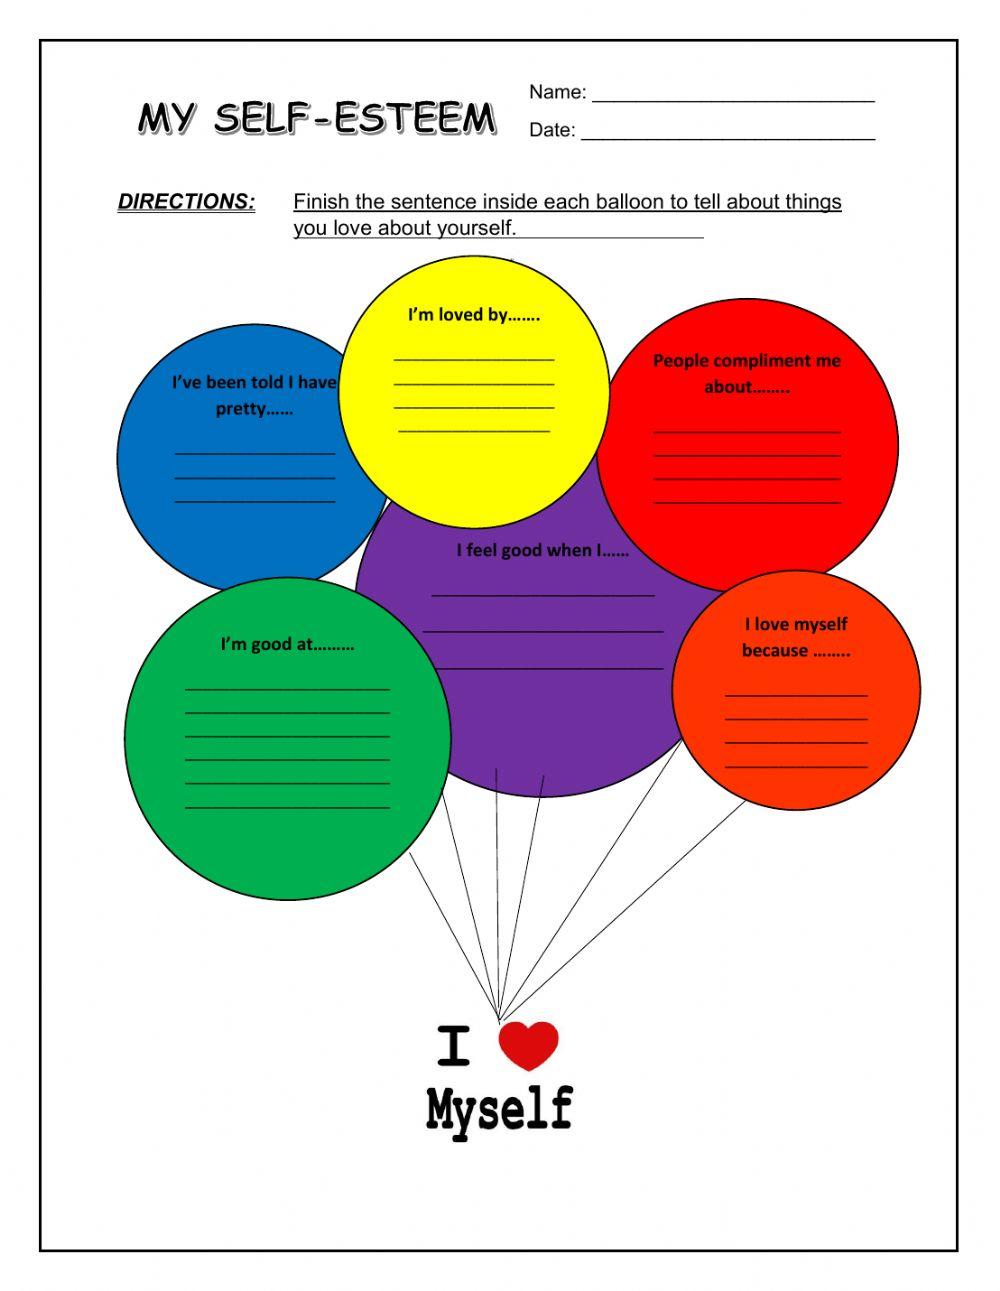 My Self-Esteem Activity Sheet Worksheet